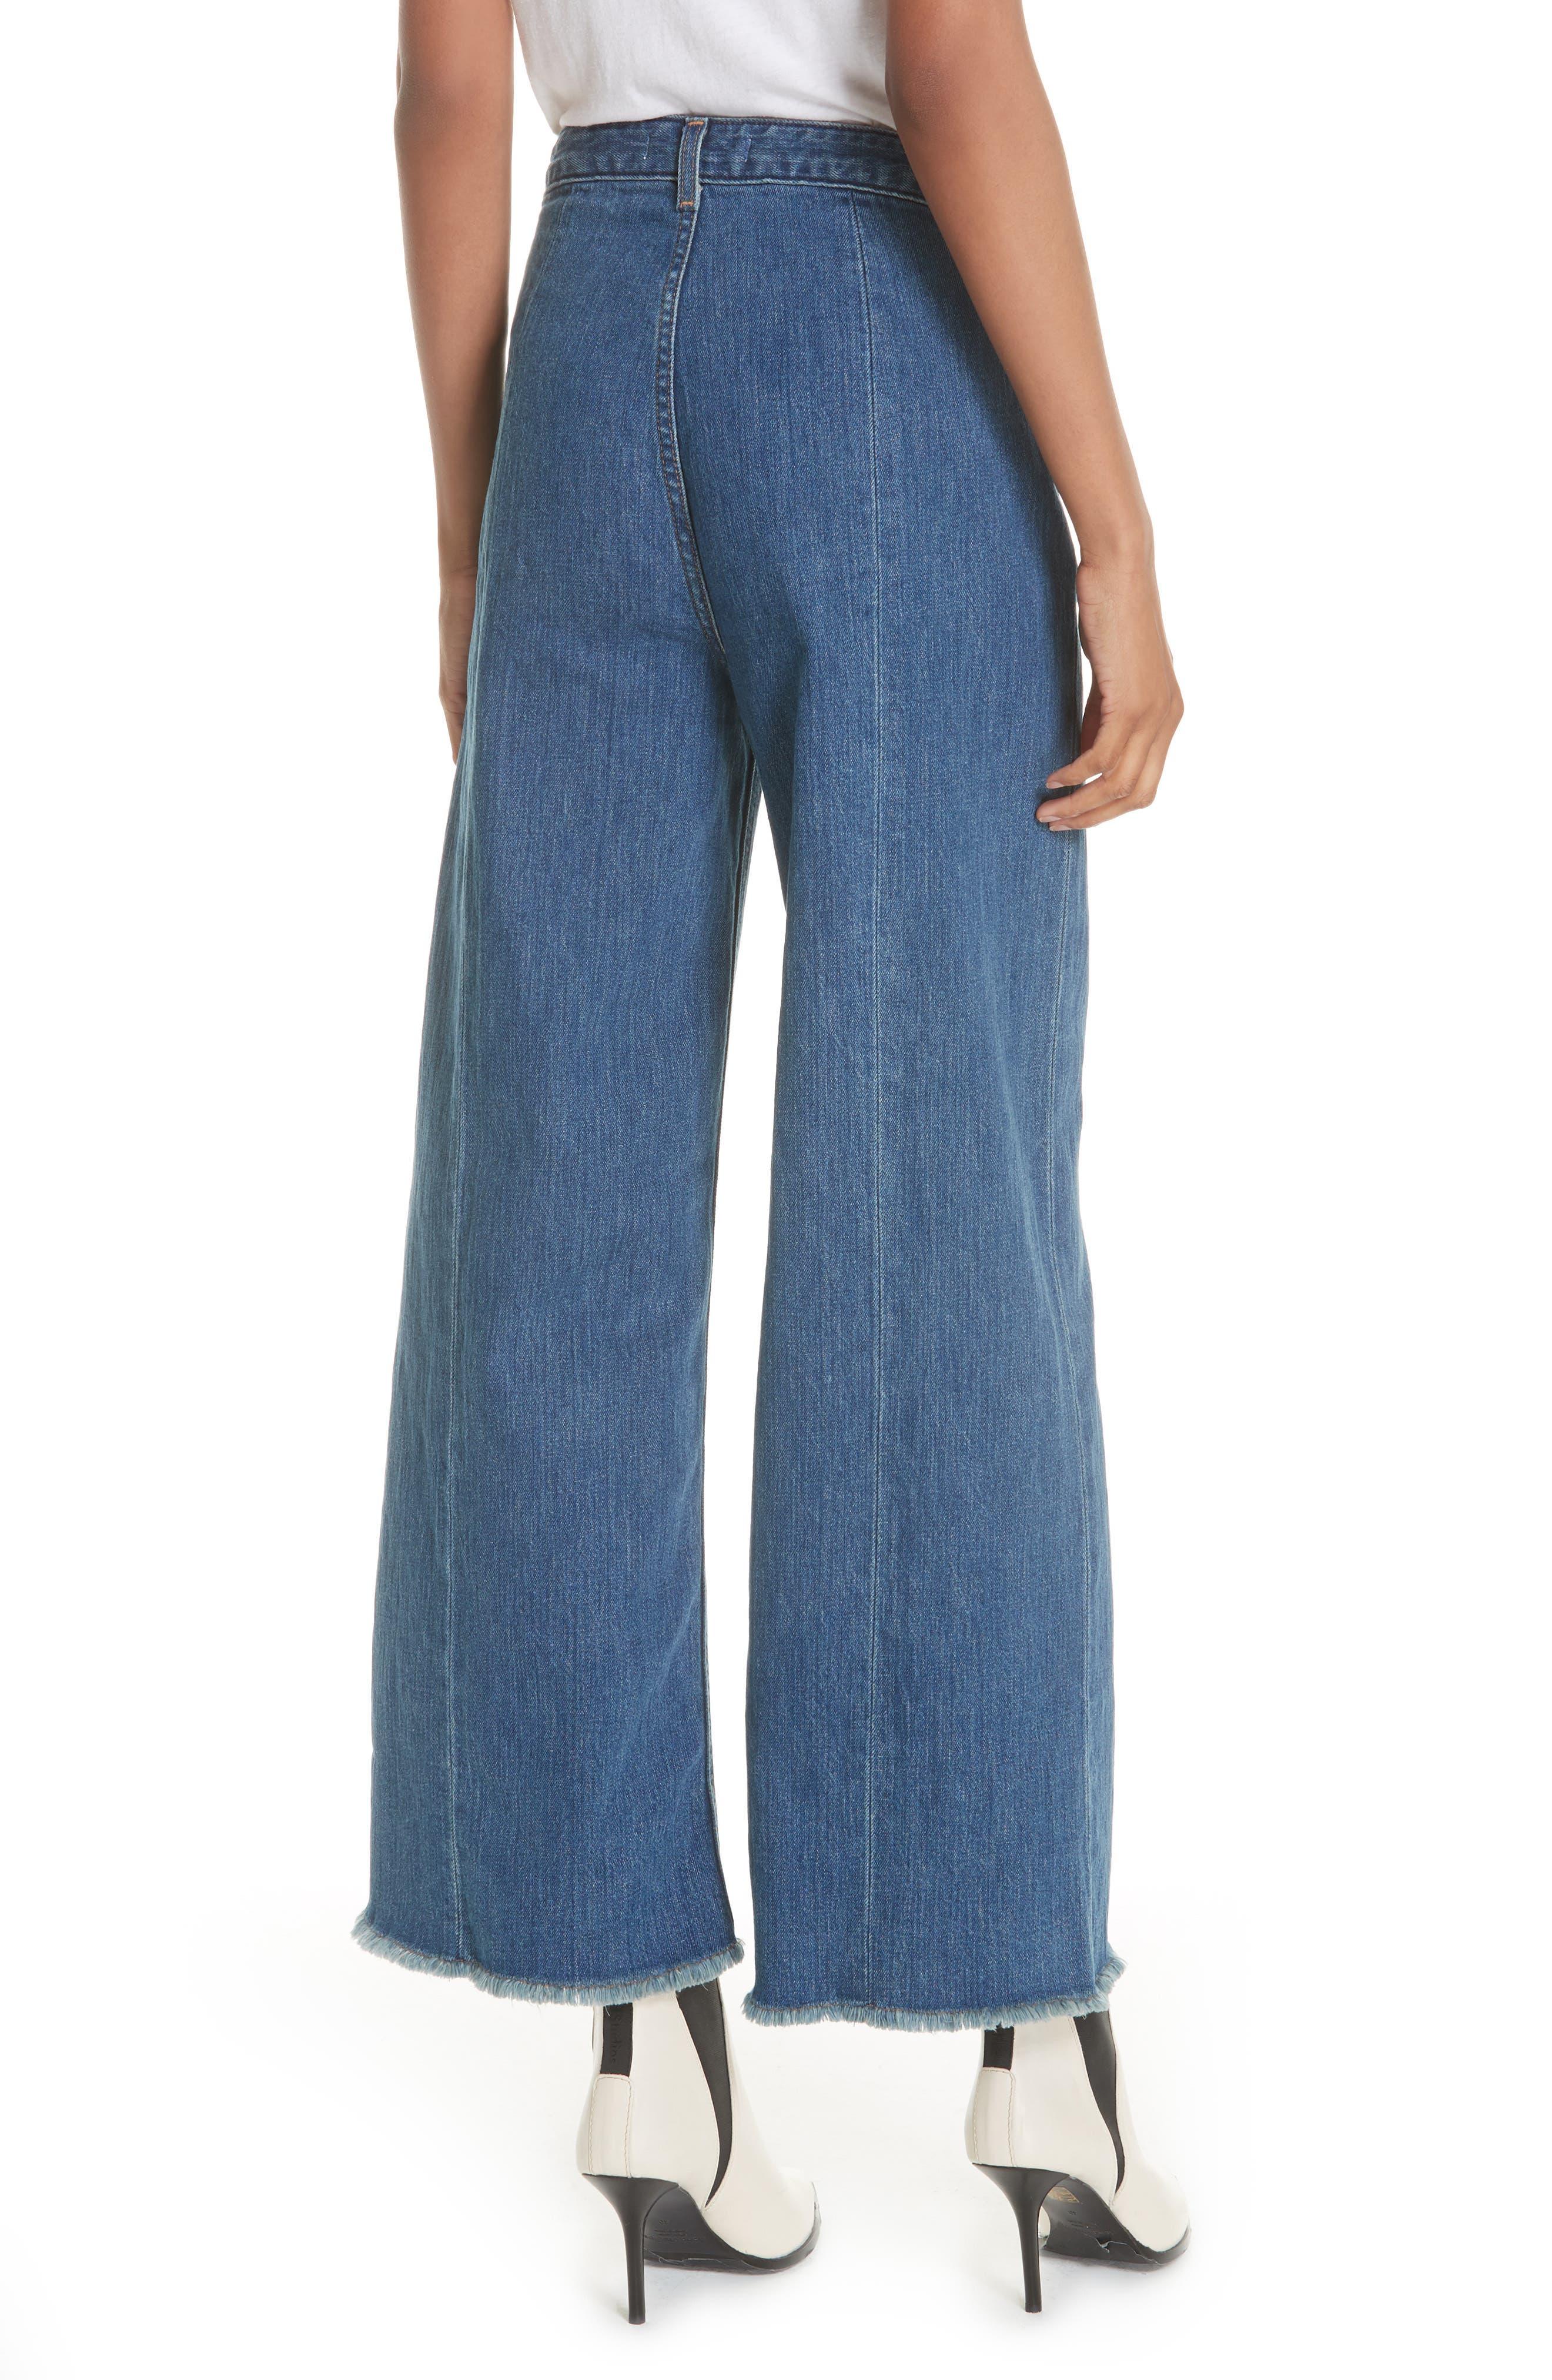 Carmine Wide Leg Jeans,                             Alternate thumbnail 2, color,                             Medium Denim